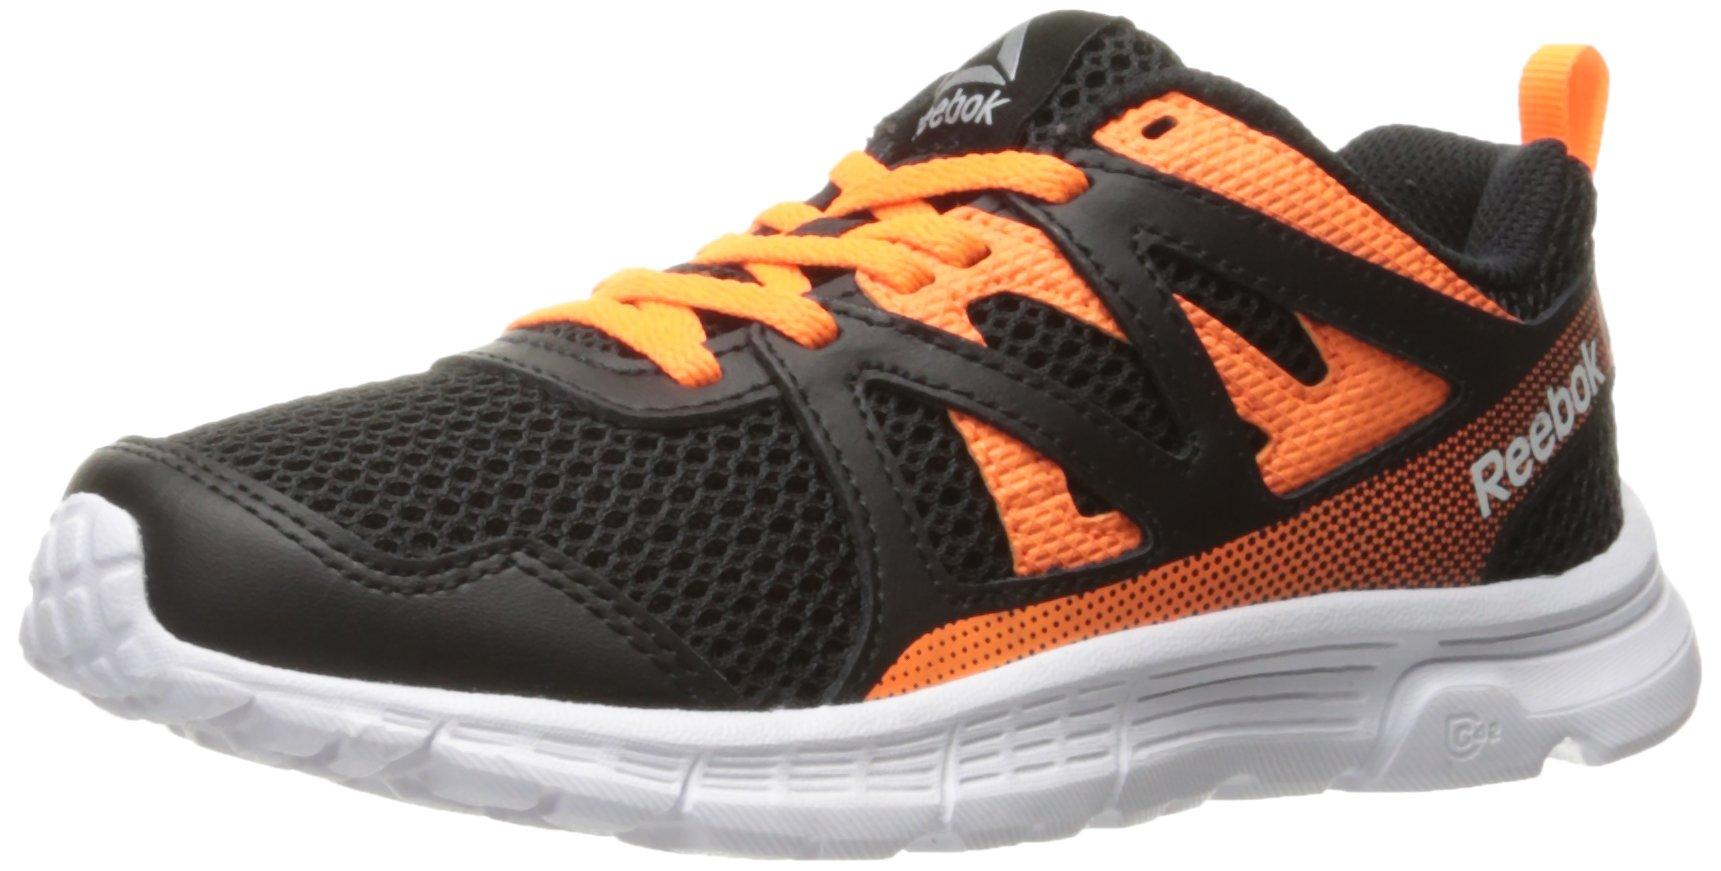 Reebok Unisex-Kids Run Supreme 2.0 Sneaker, Lush